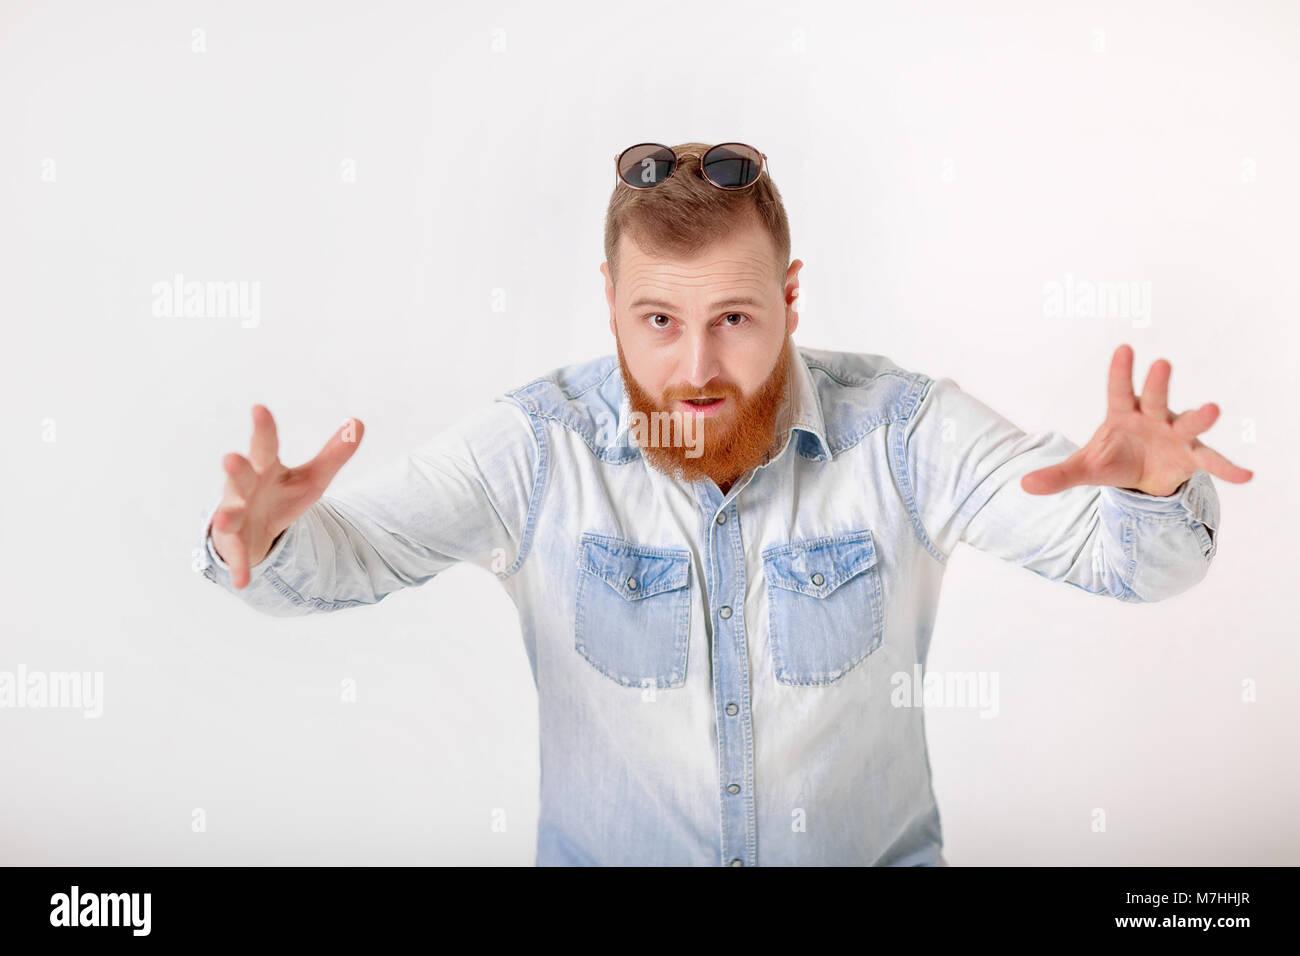 beard man in sunglasses and denim shirt - Stock Image